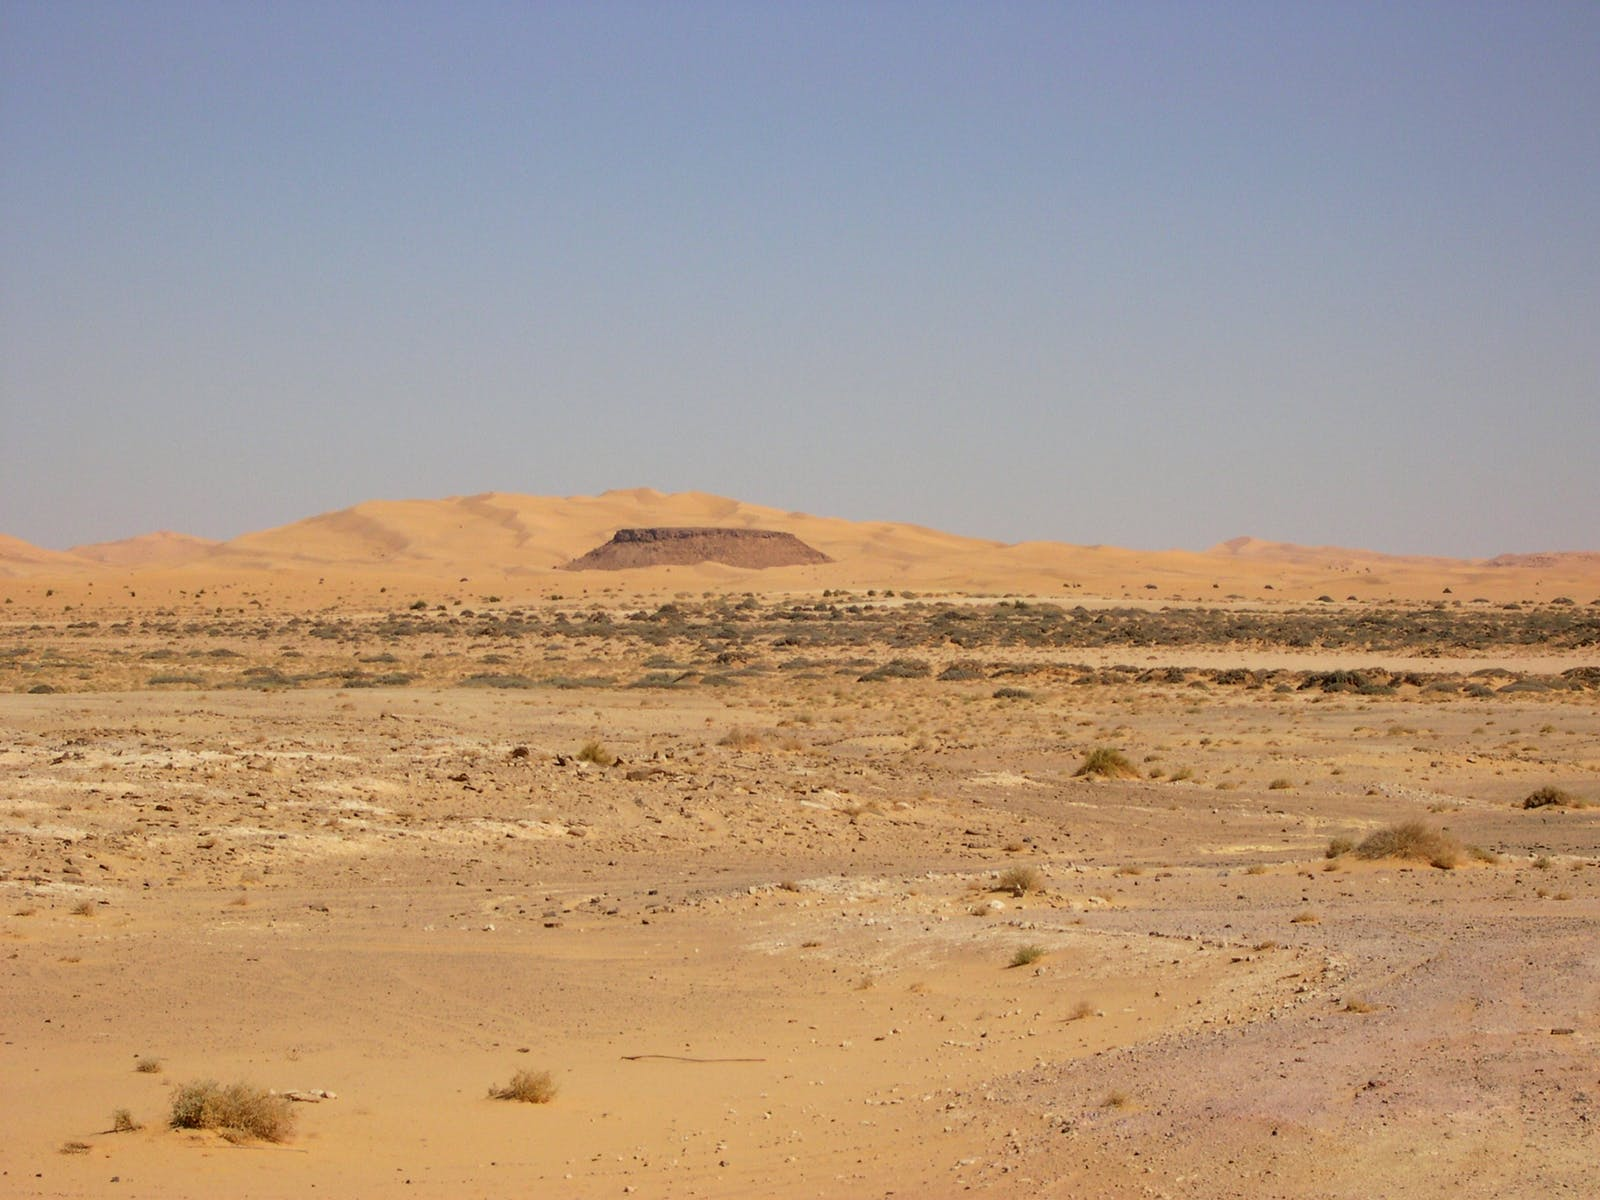 West Sahara Desert